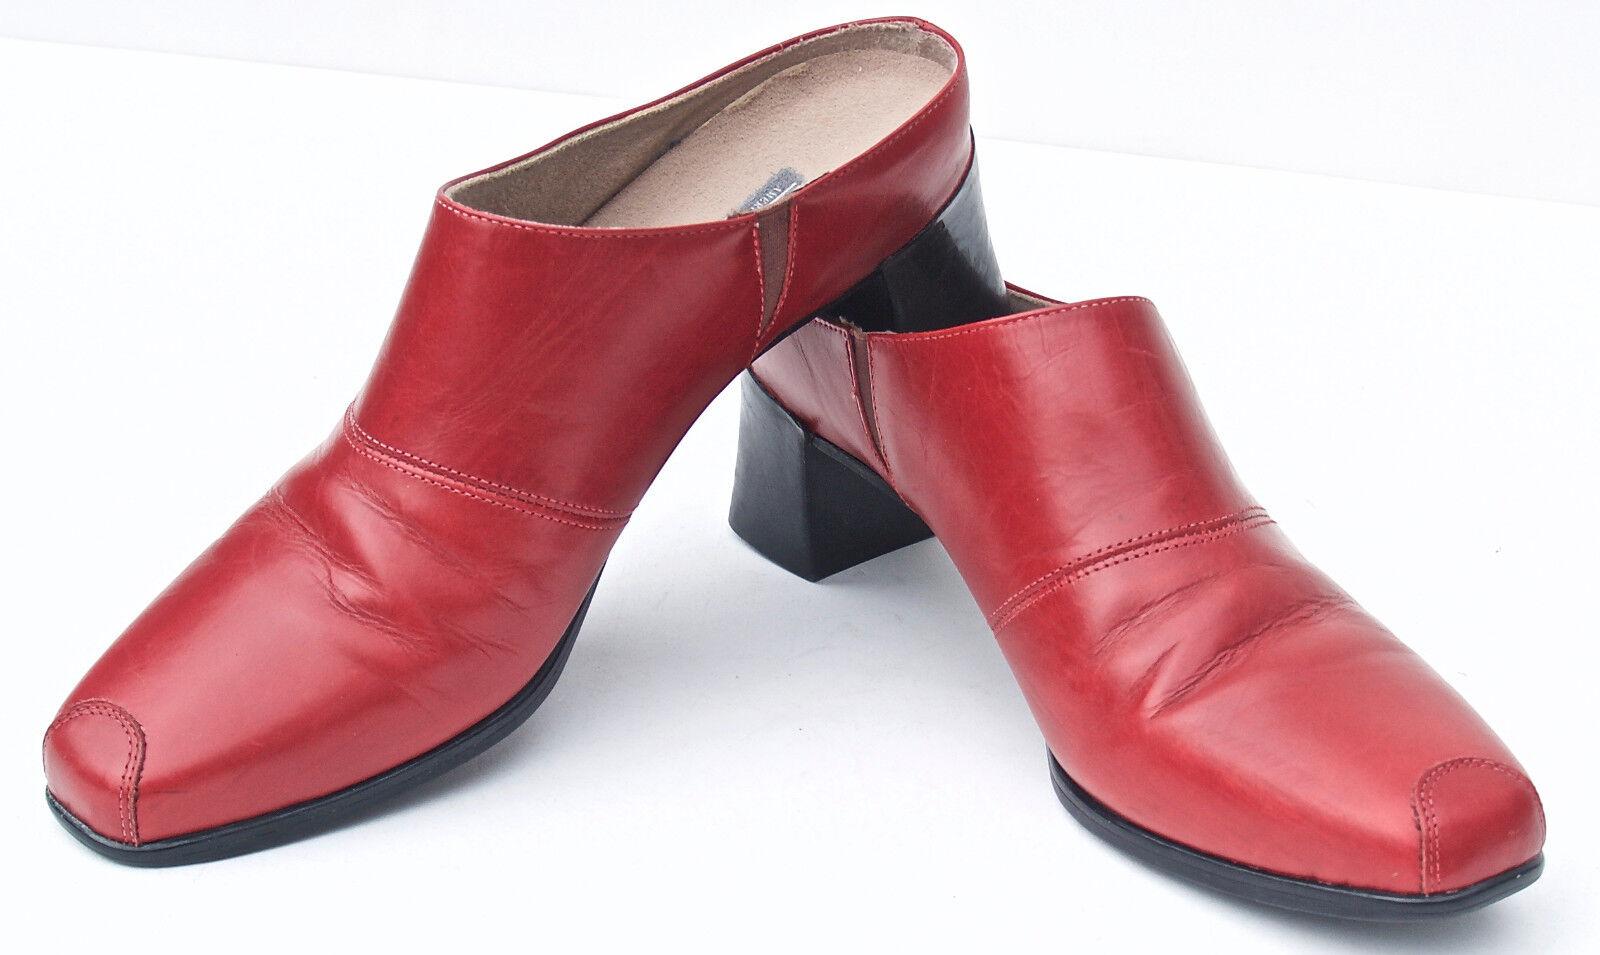 Munro American ladies shoes heels casual work dress 8 N leather  USA  EUC